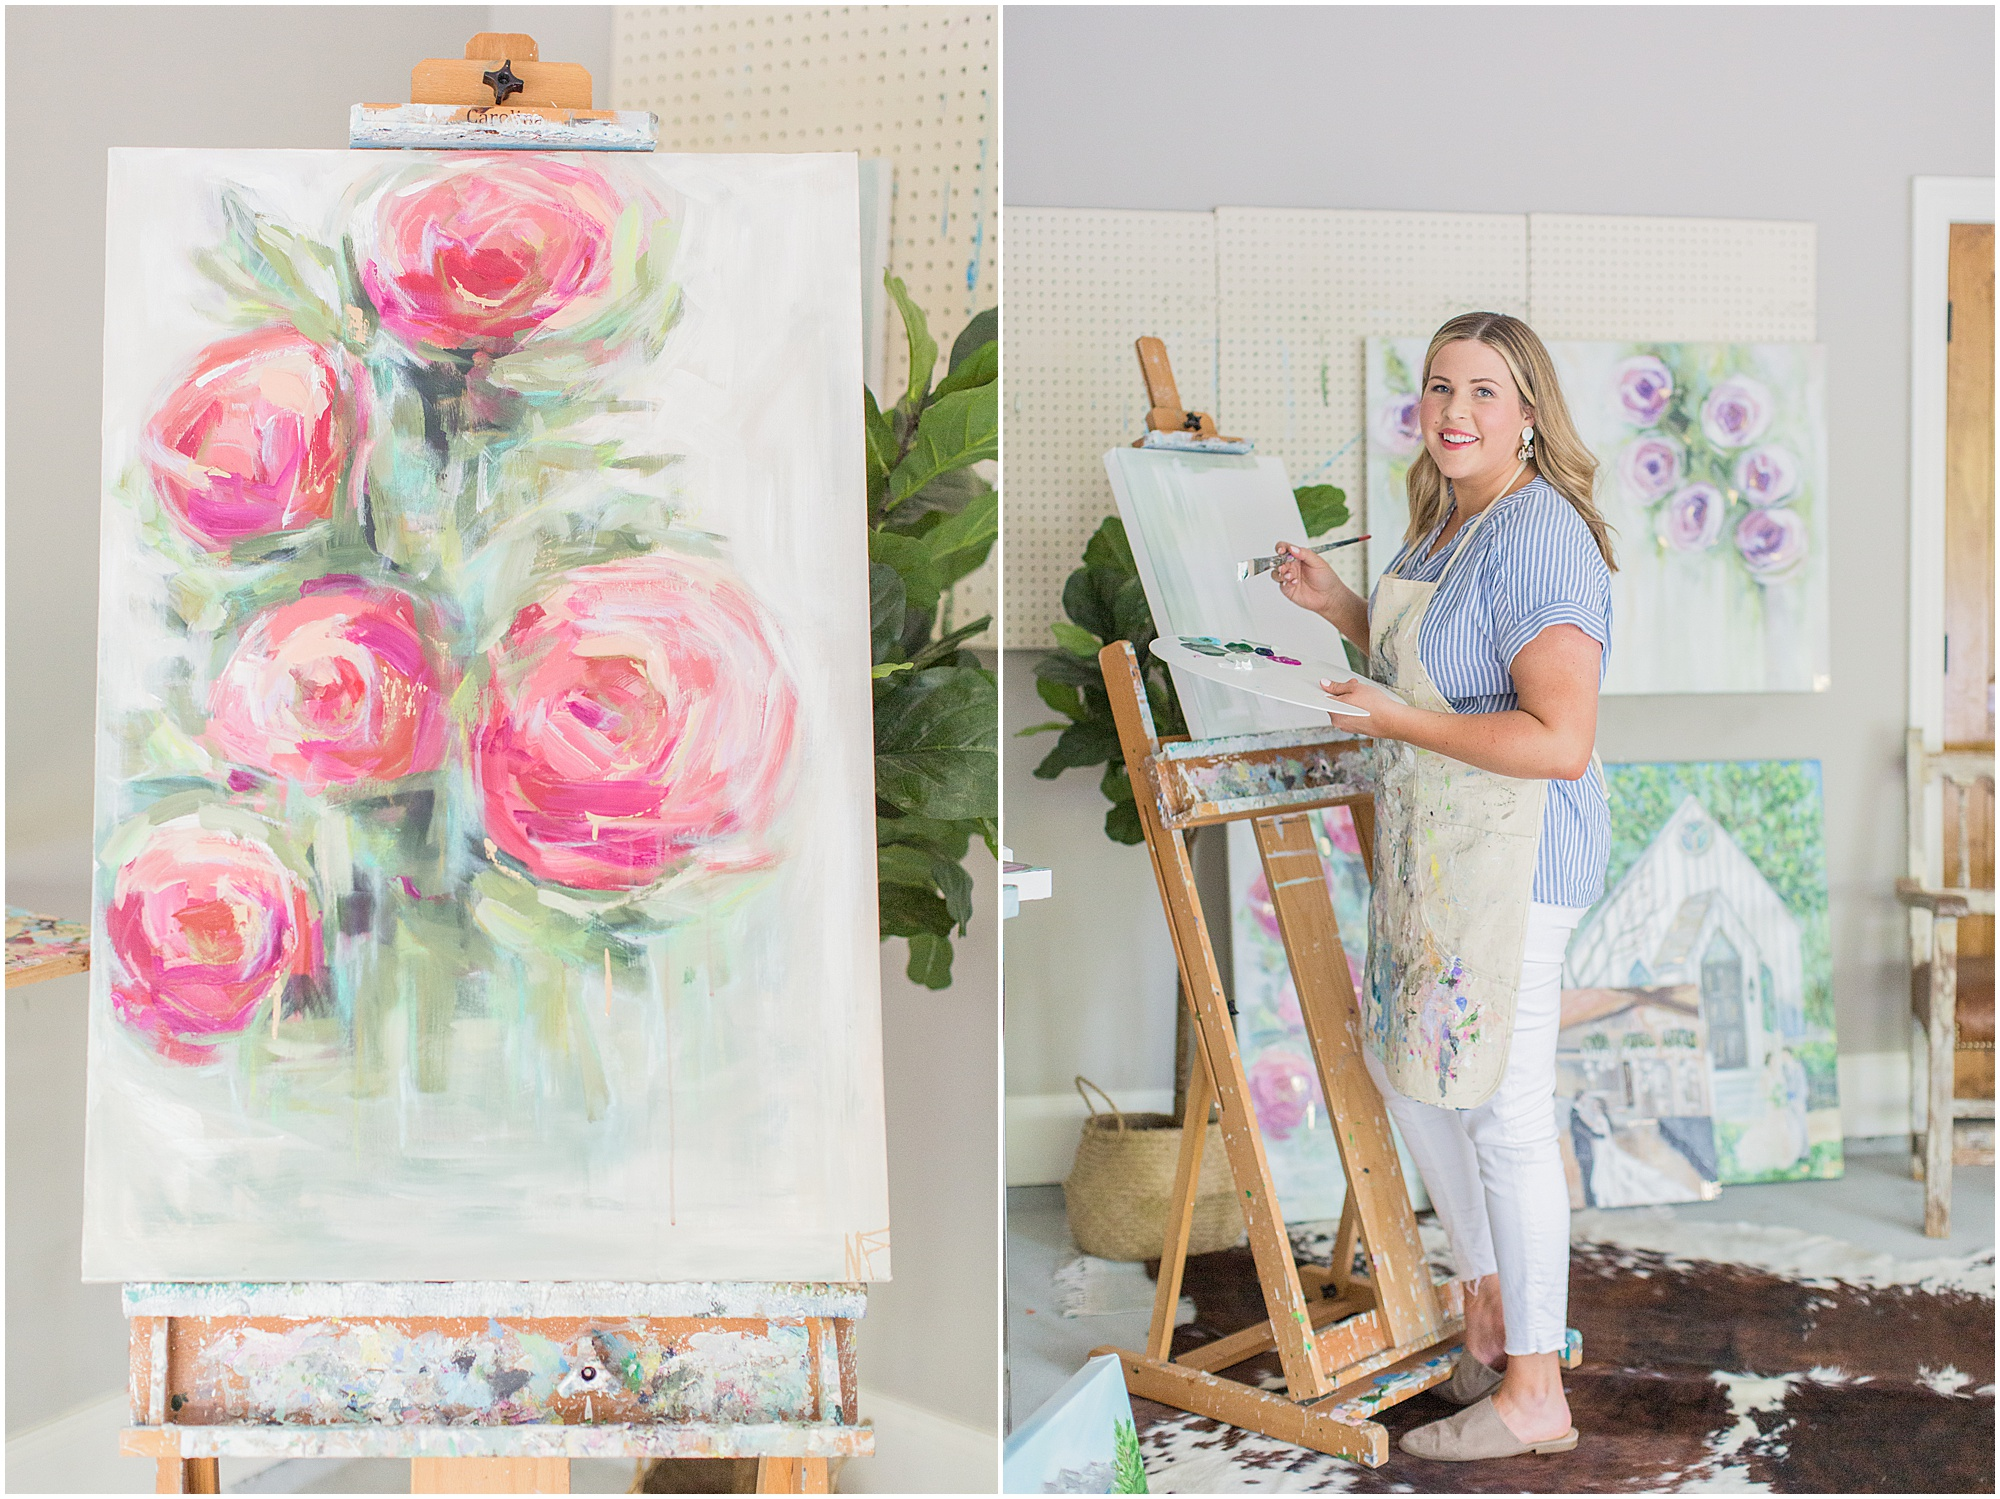 miriam-shufelt-art-mississippi-live-wedding-painter_0011.jpg